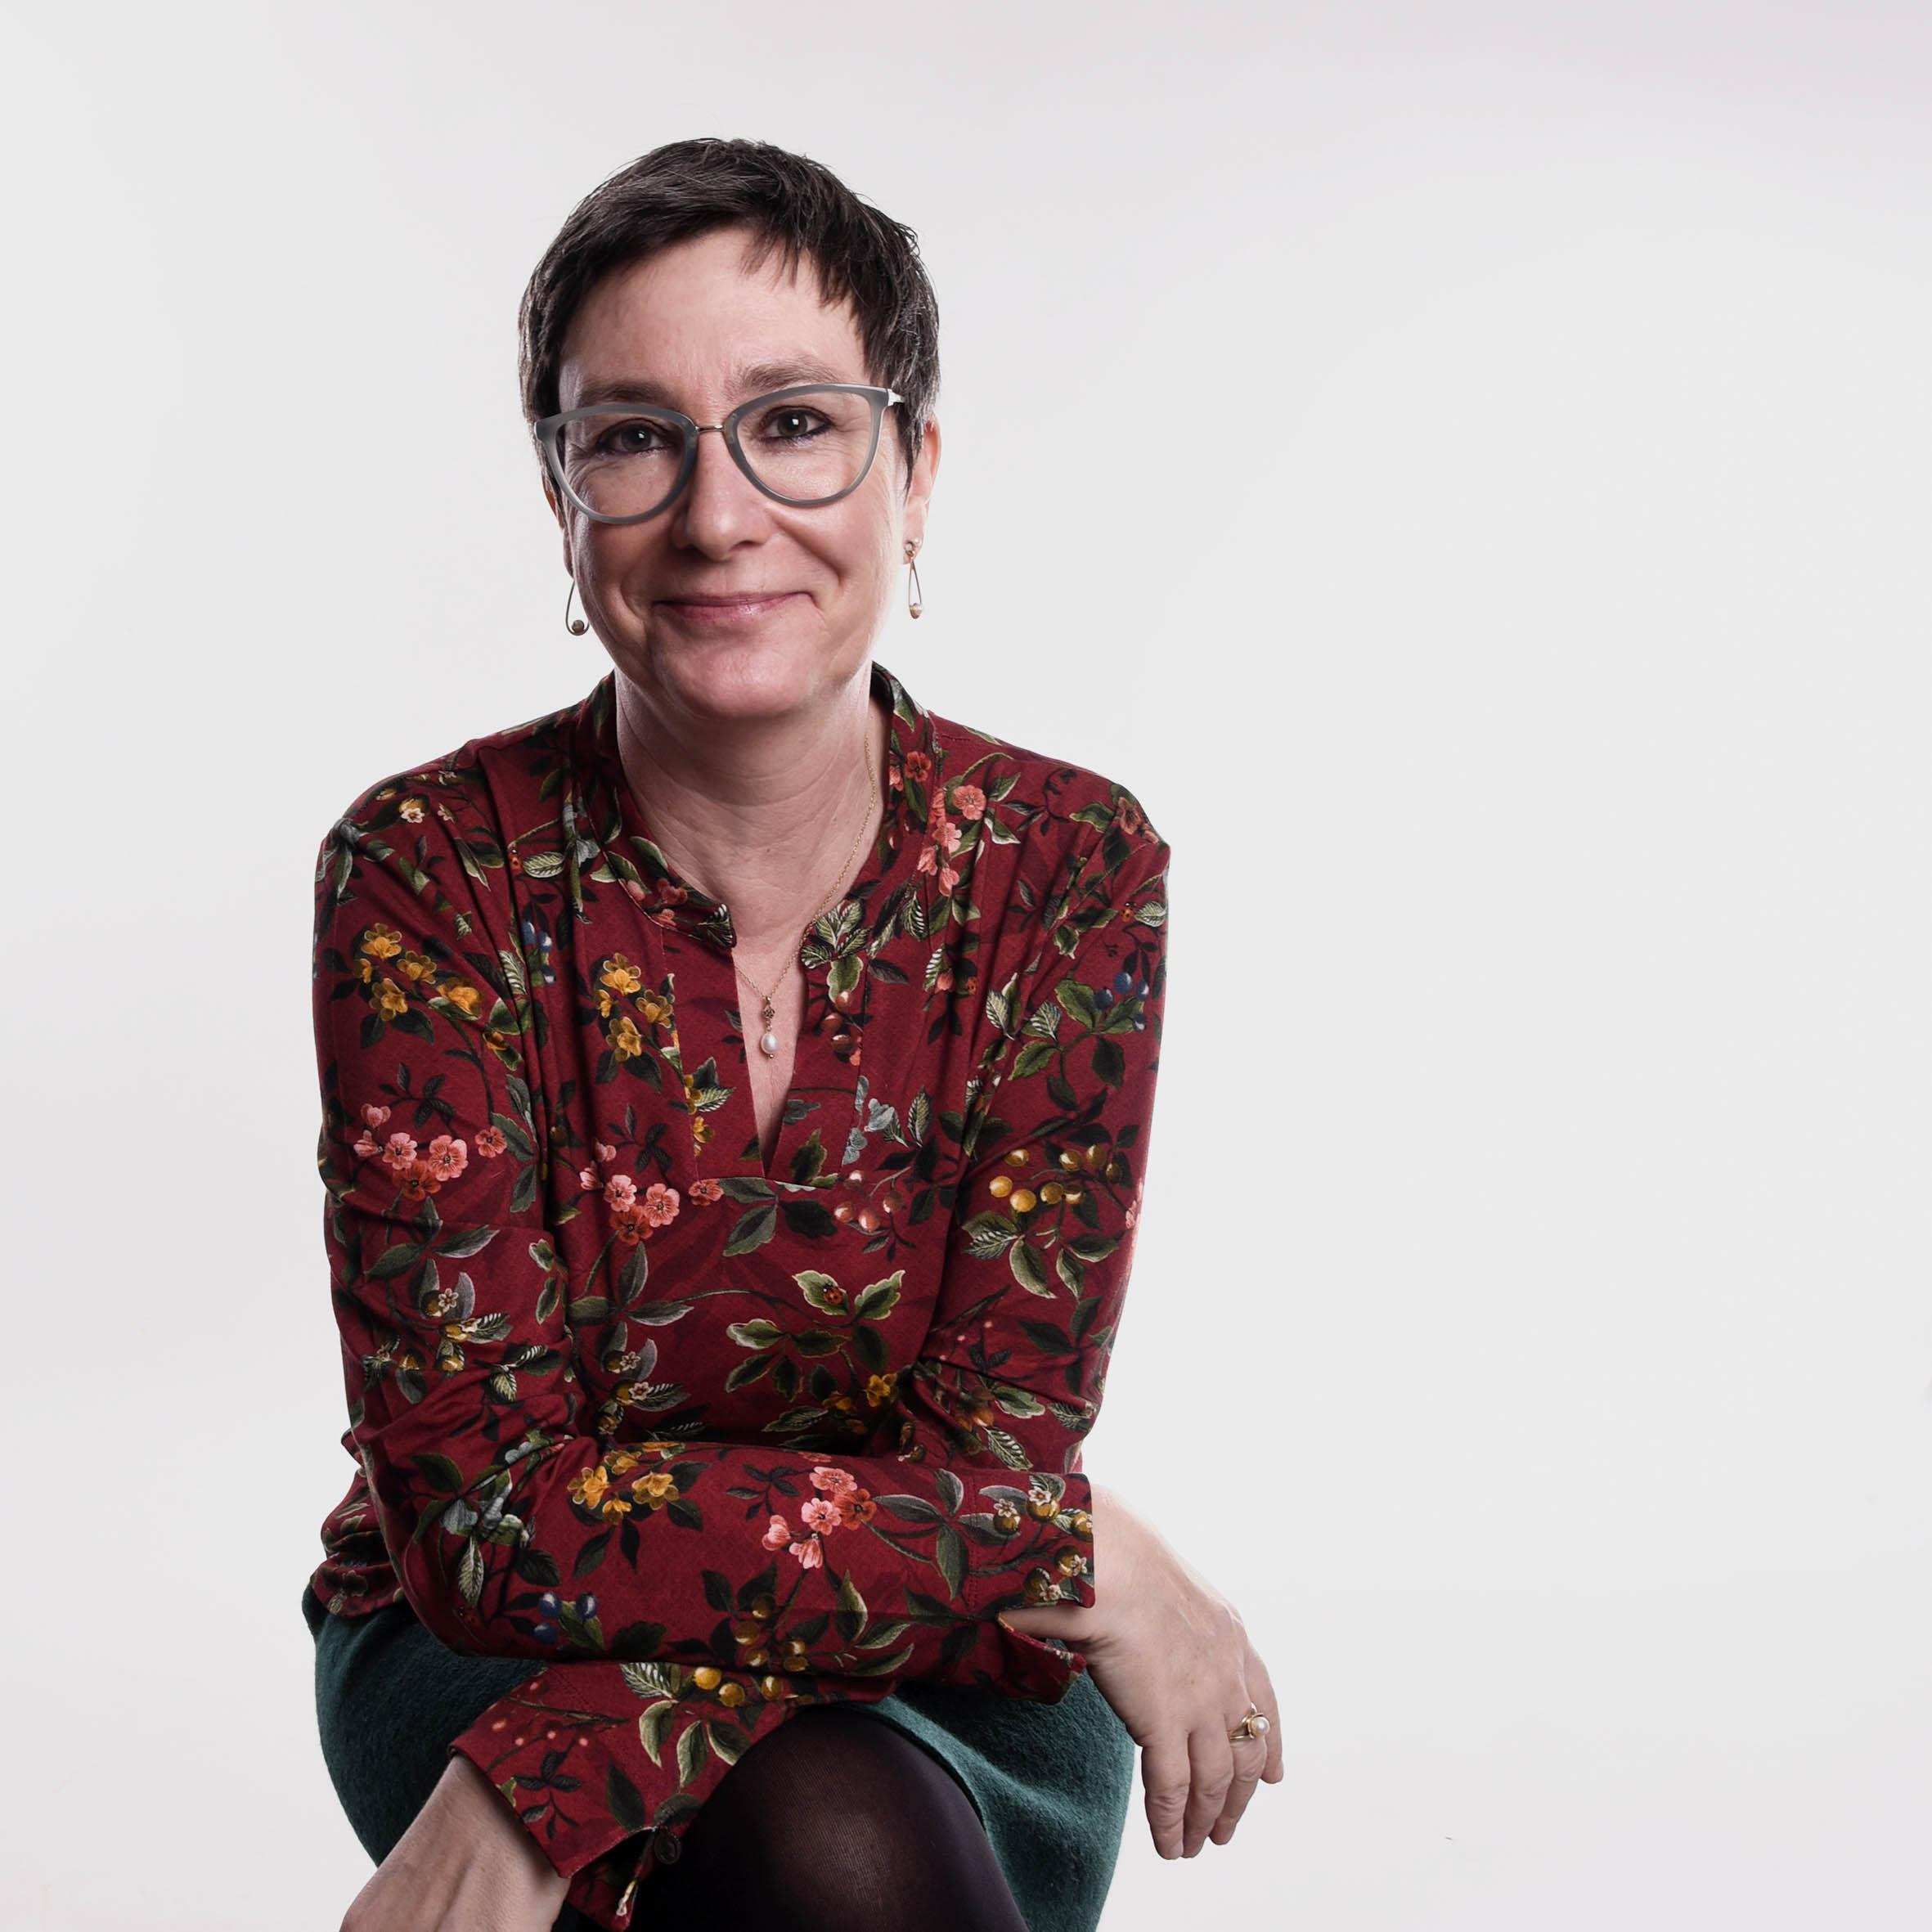 Diplom-Psycholgin und Systemische Therapeutin Andrea Schulte (Porträt)